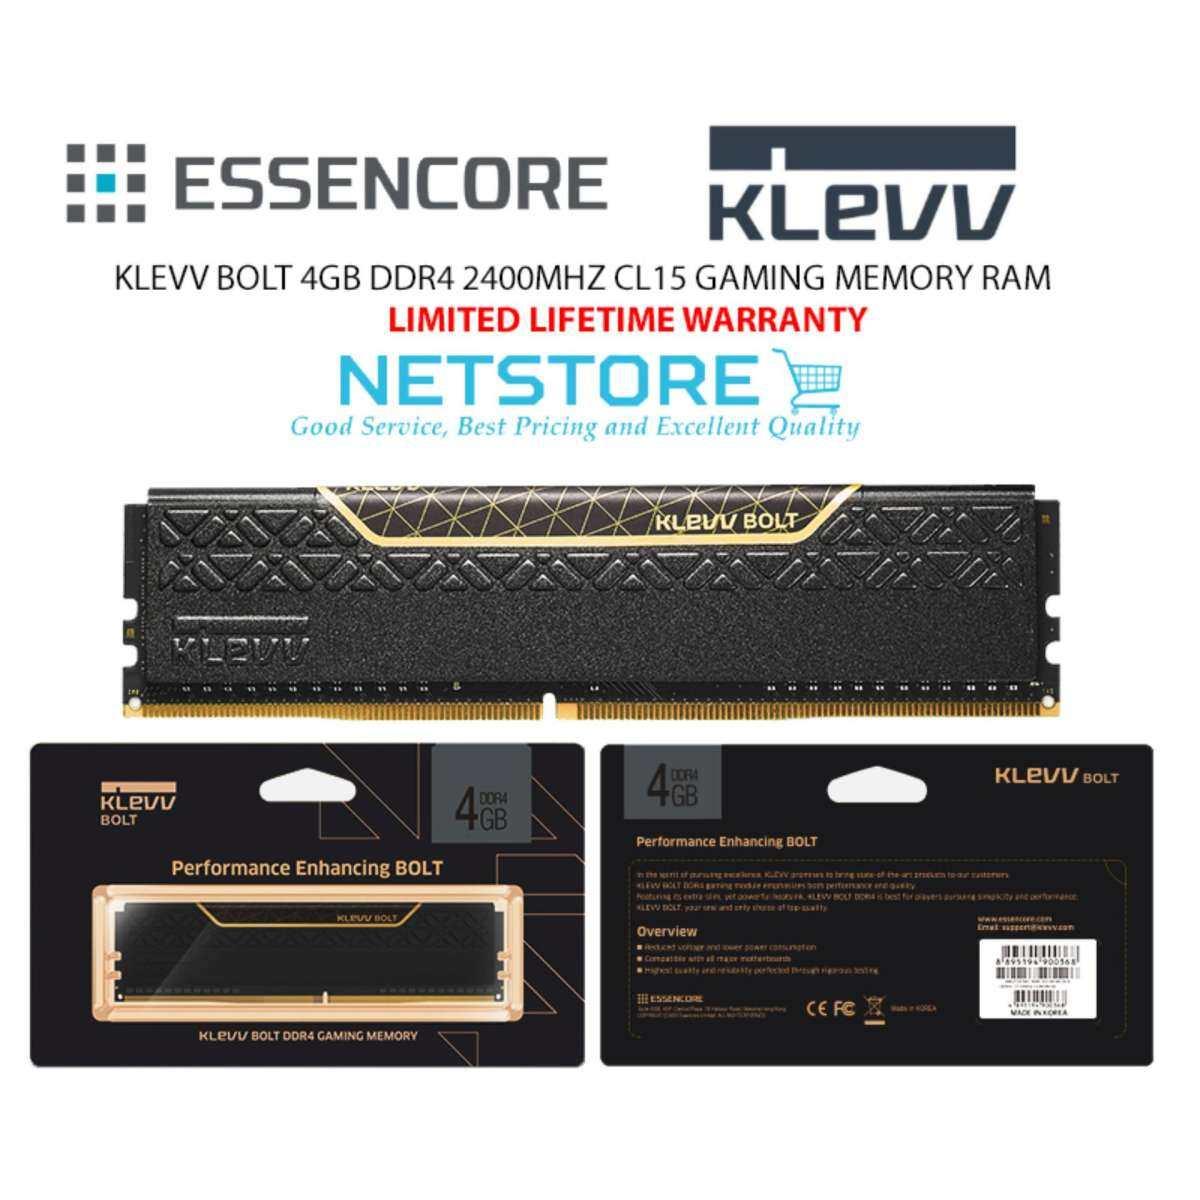 KLEVV BOLT 4GB DDR4 2400MHZ CL15 GAMING MEMORY RAM